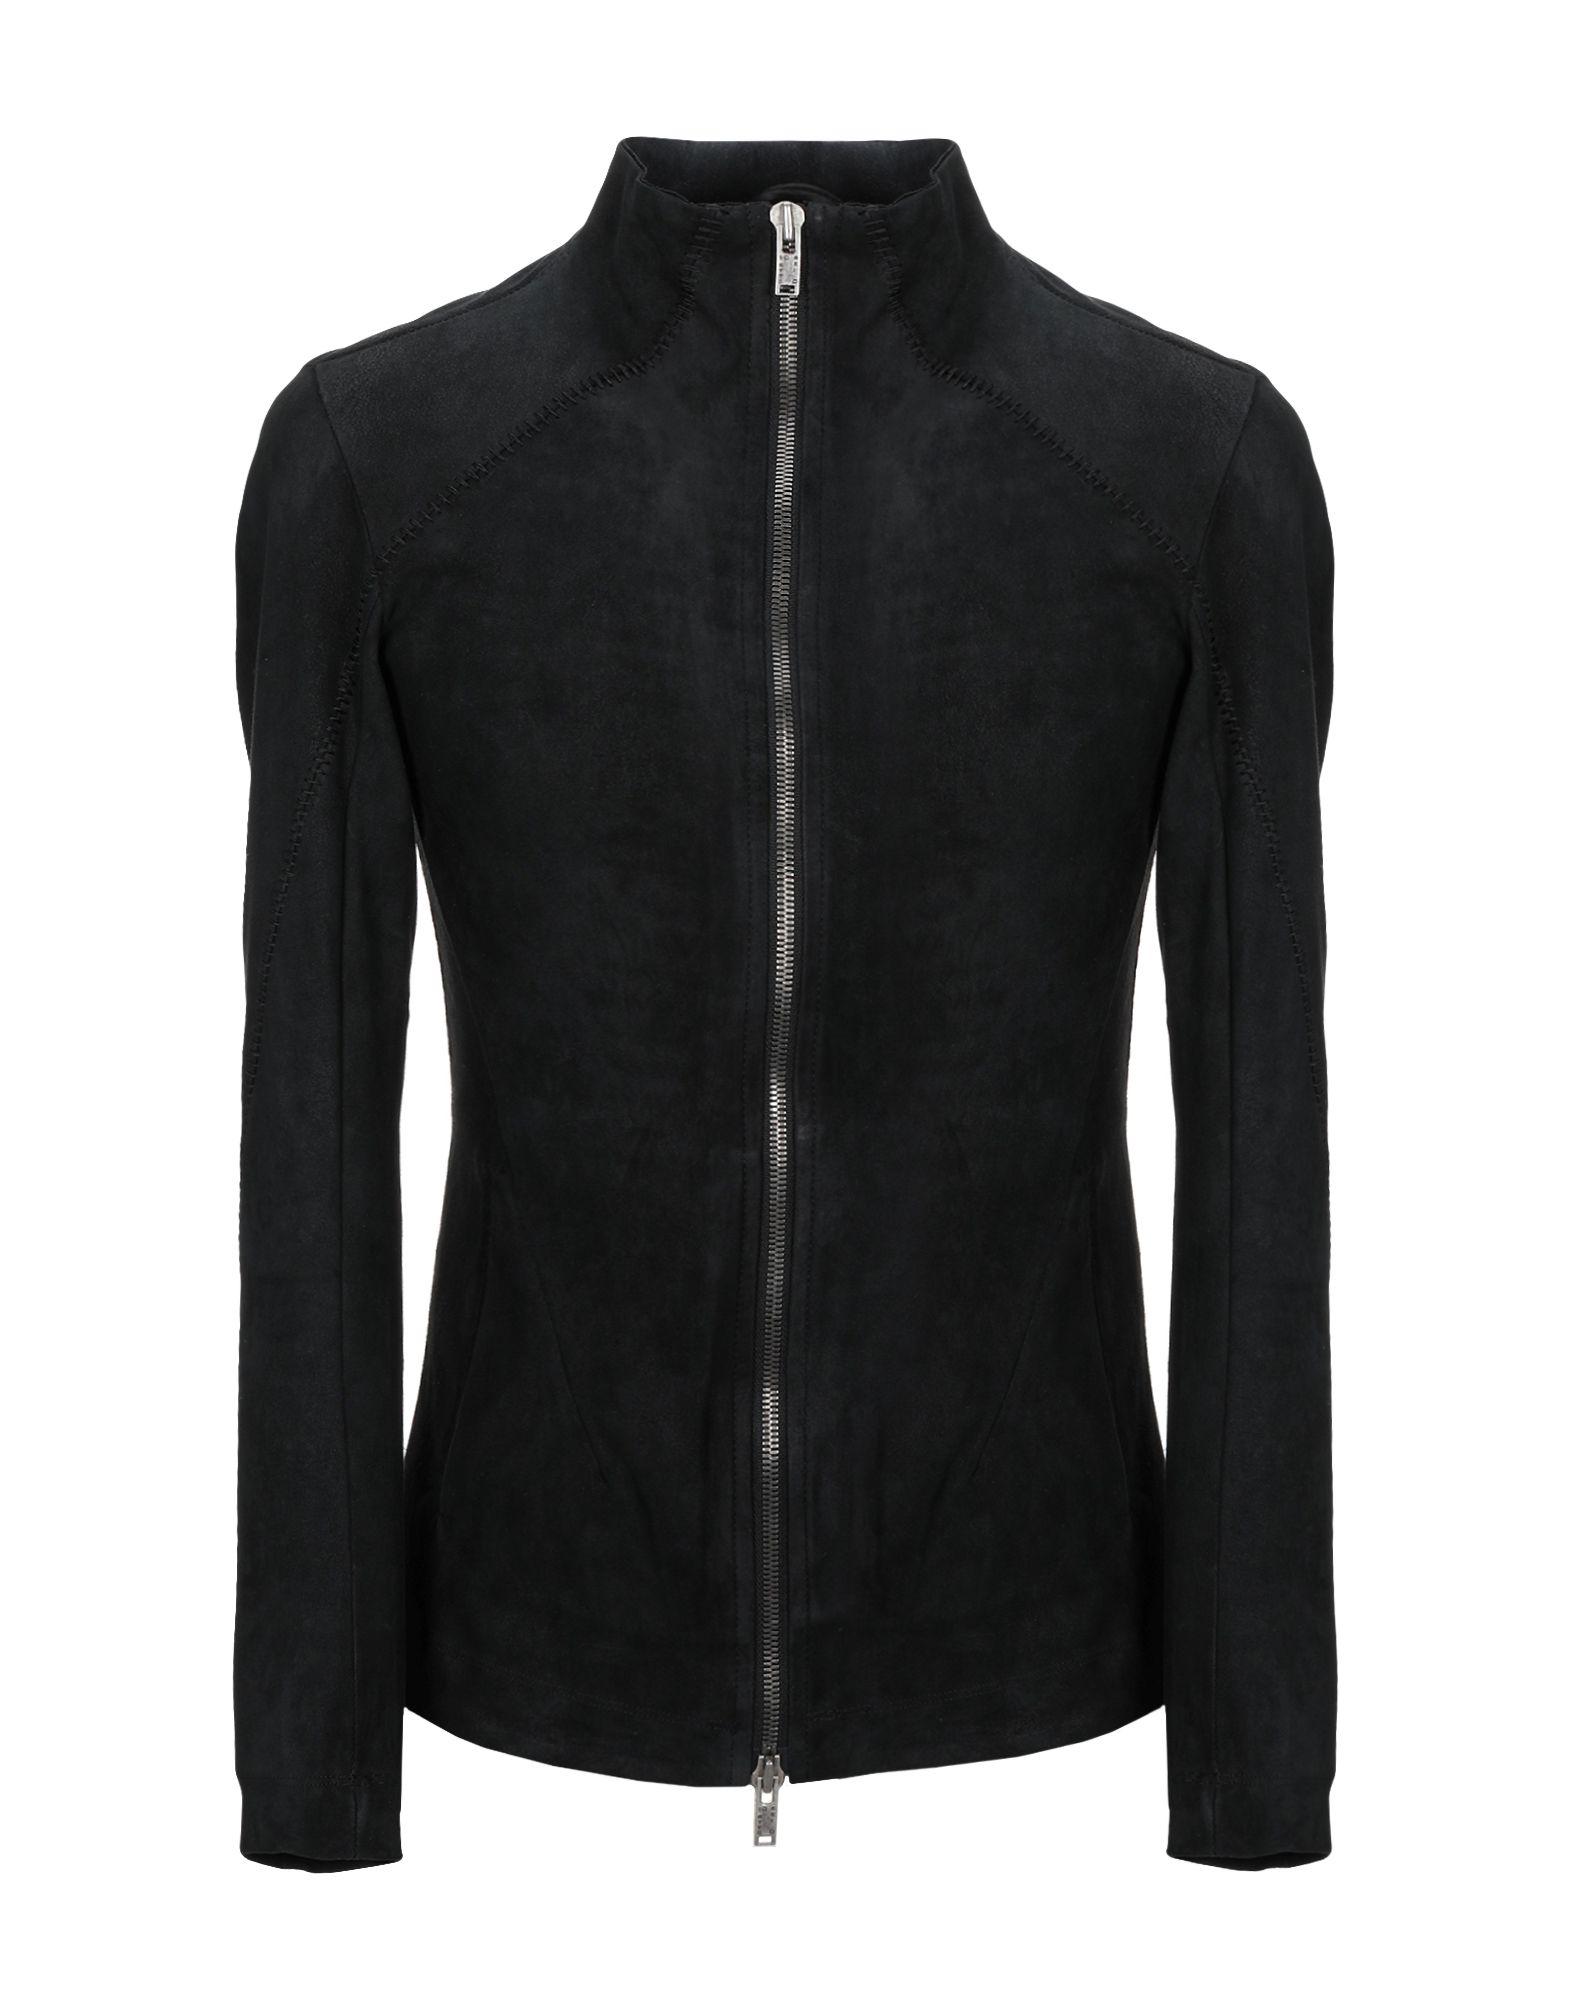 10sei0otto Куртка 10sei0otto кардиган